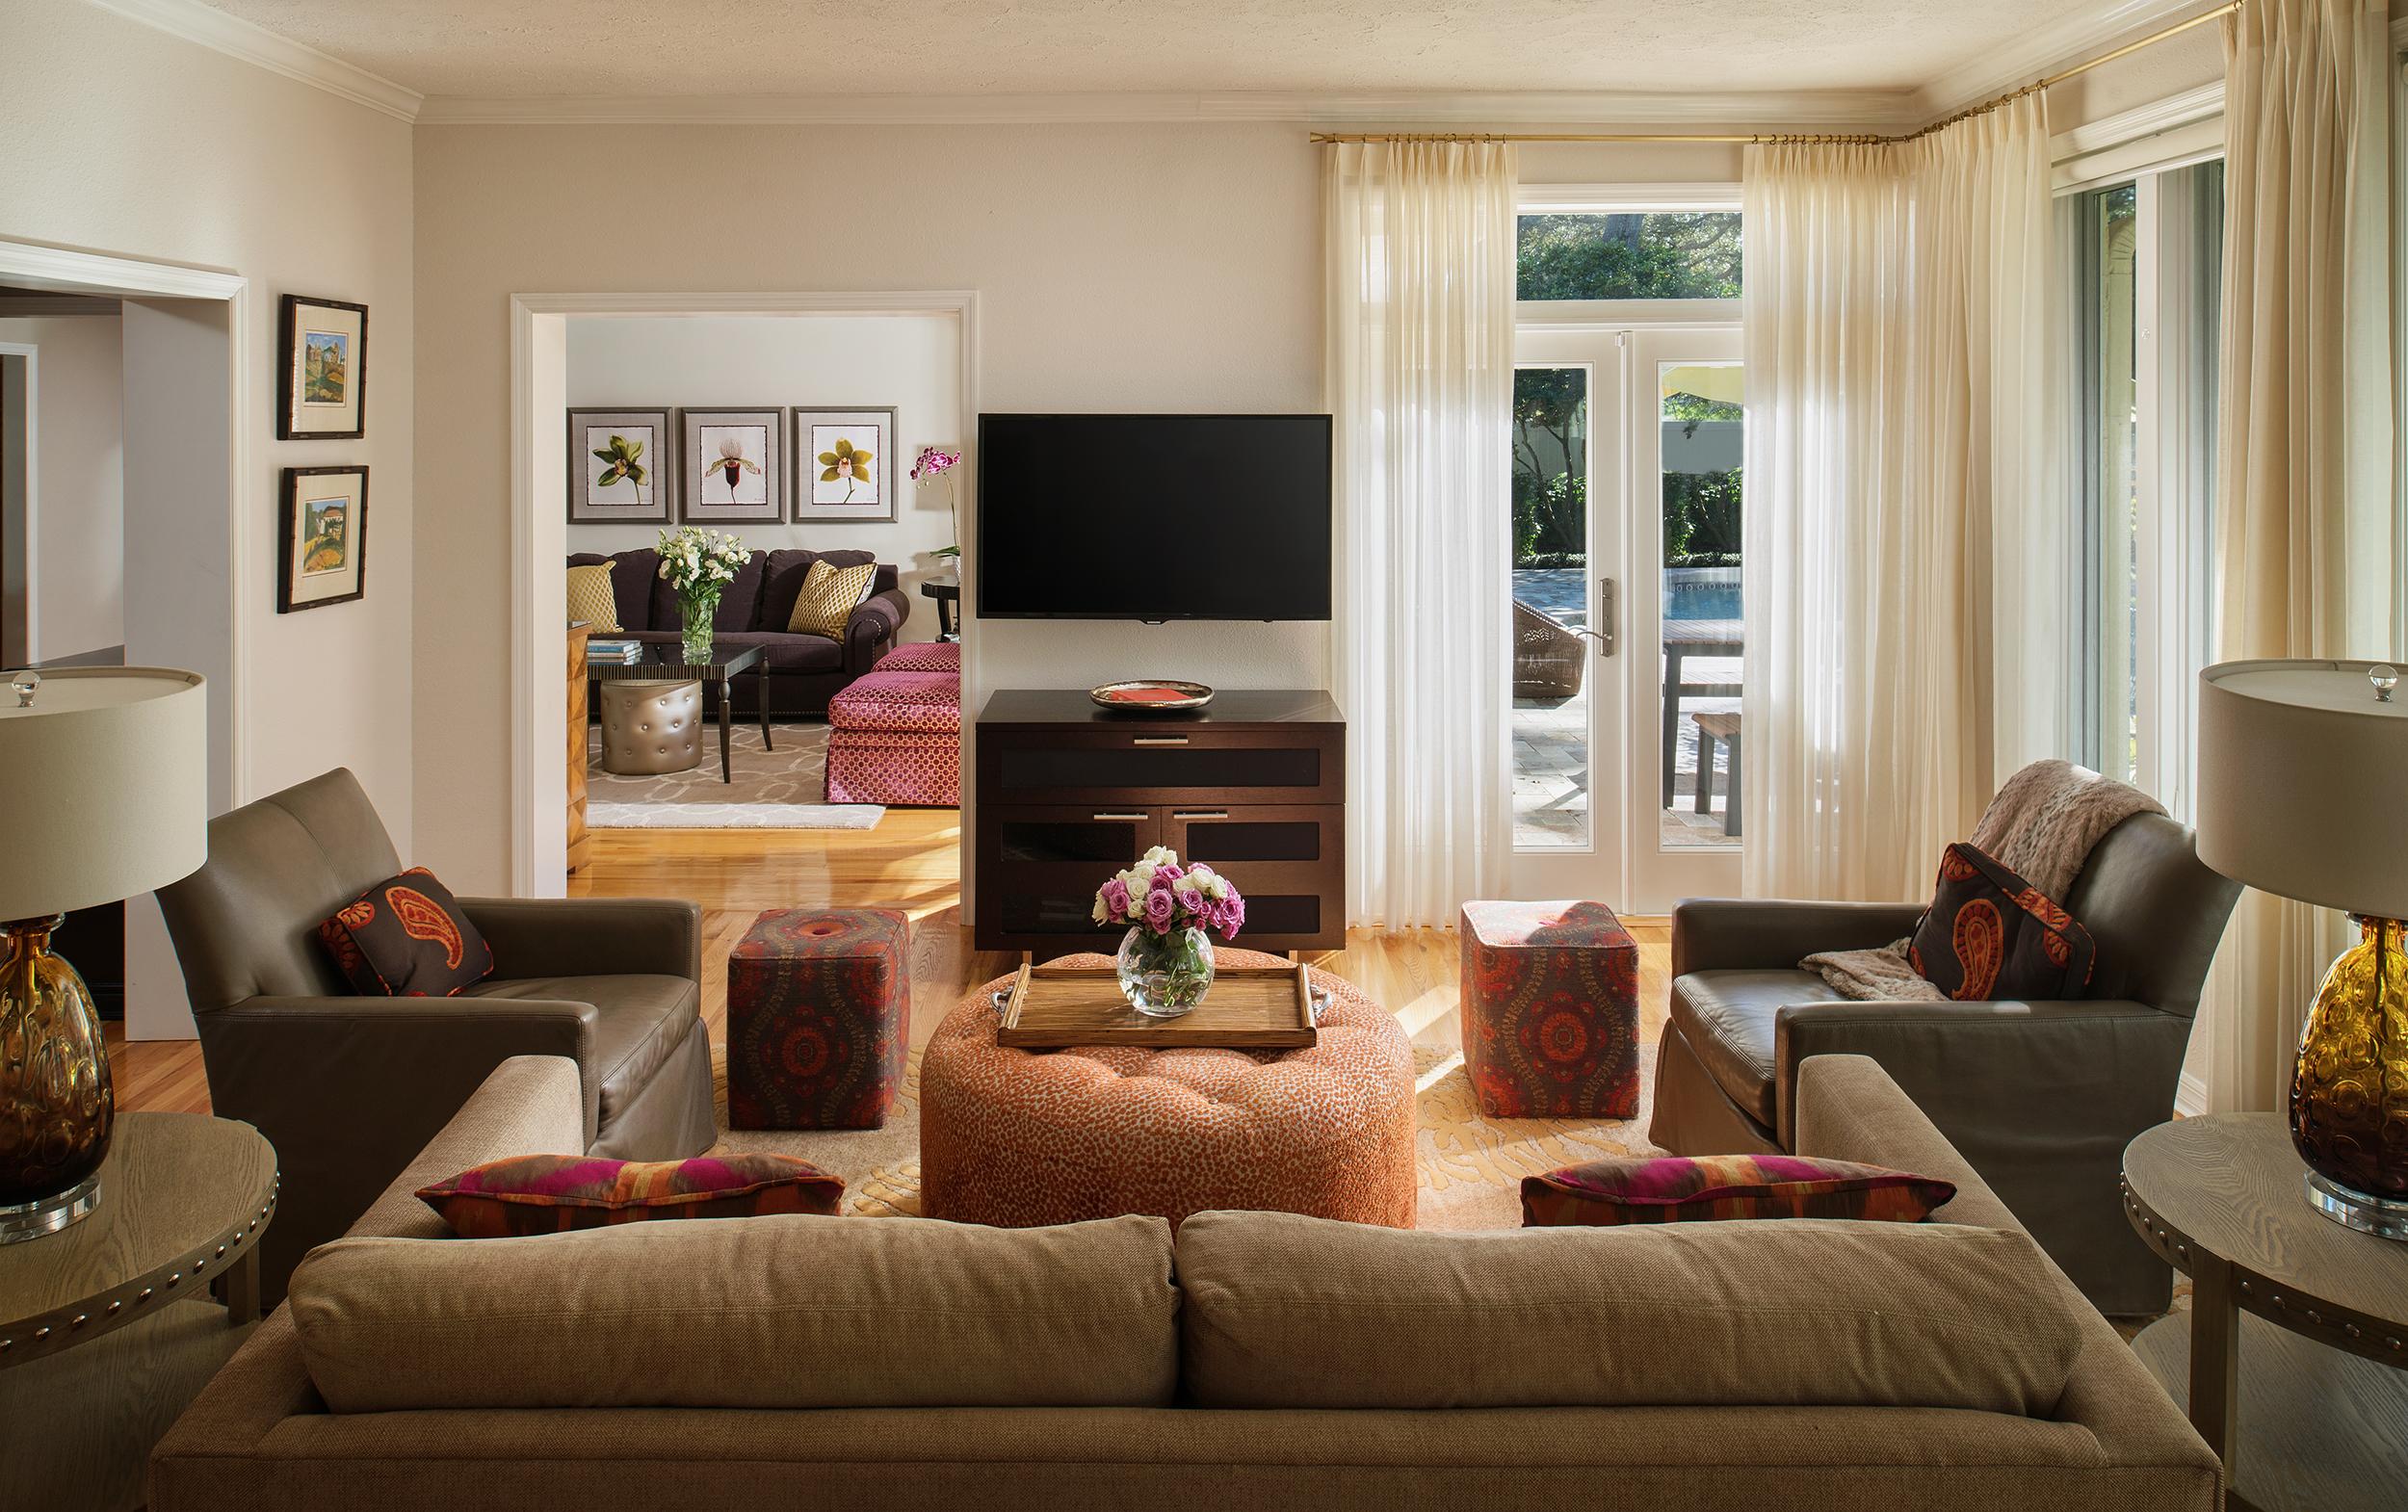 Kylie-Italiano---Shore-Crest-House---Family-Room.jpg